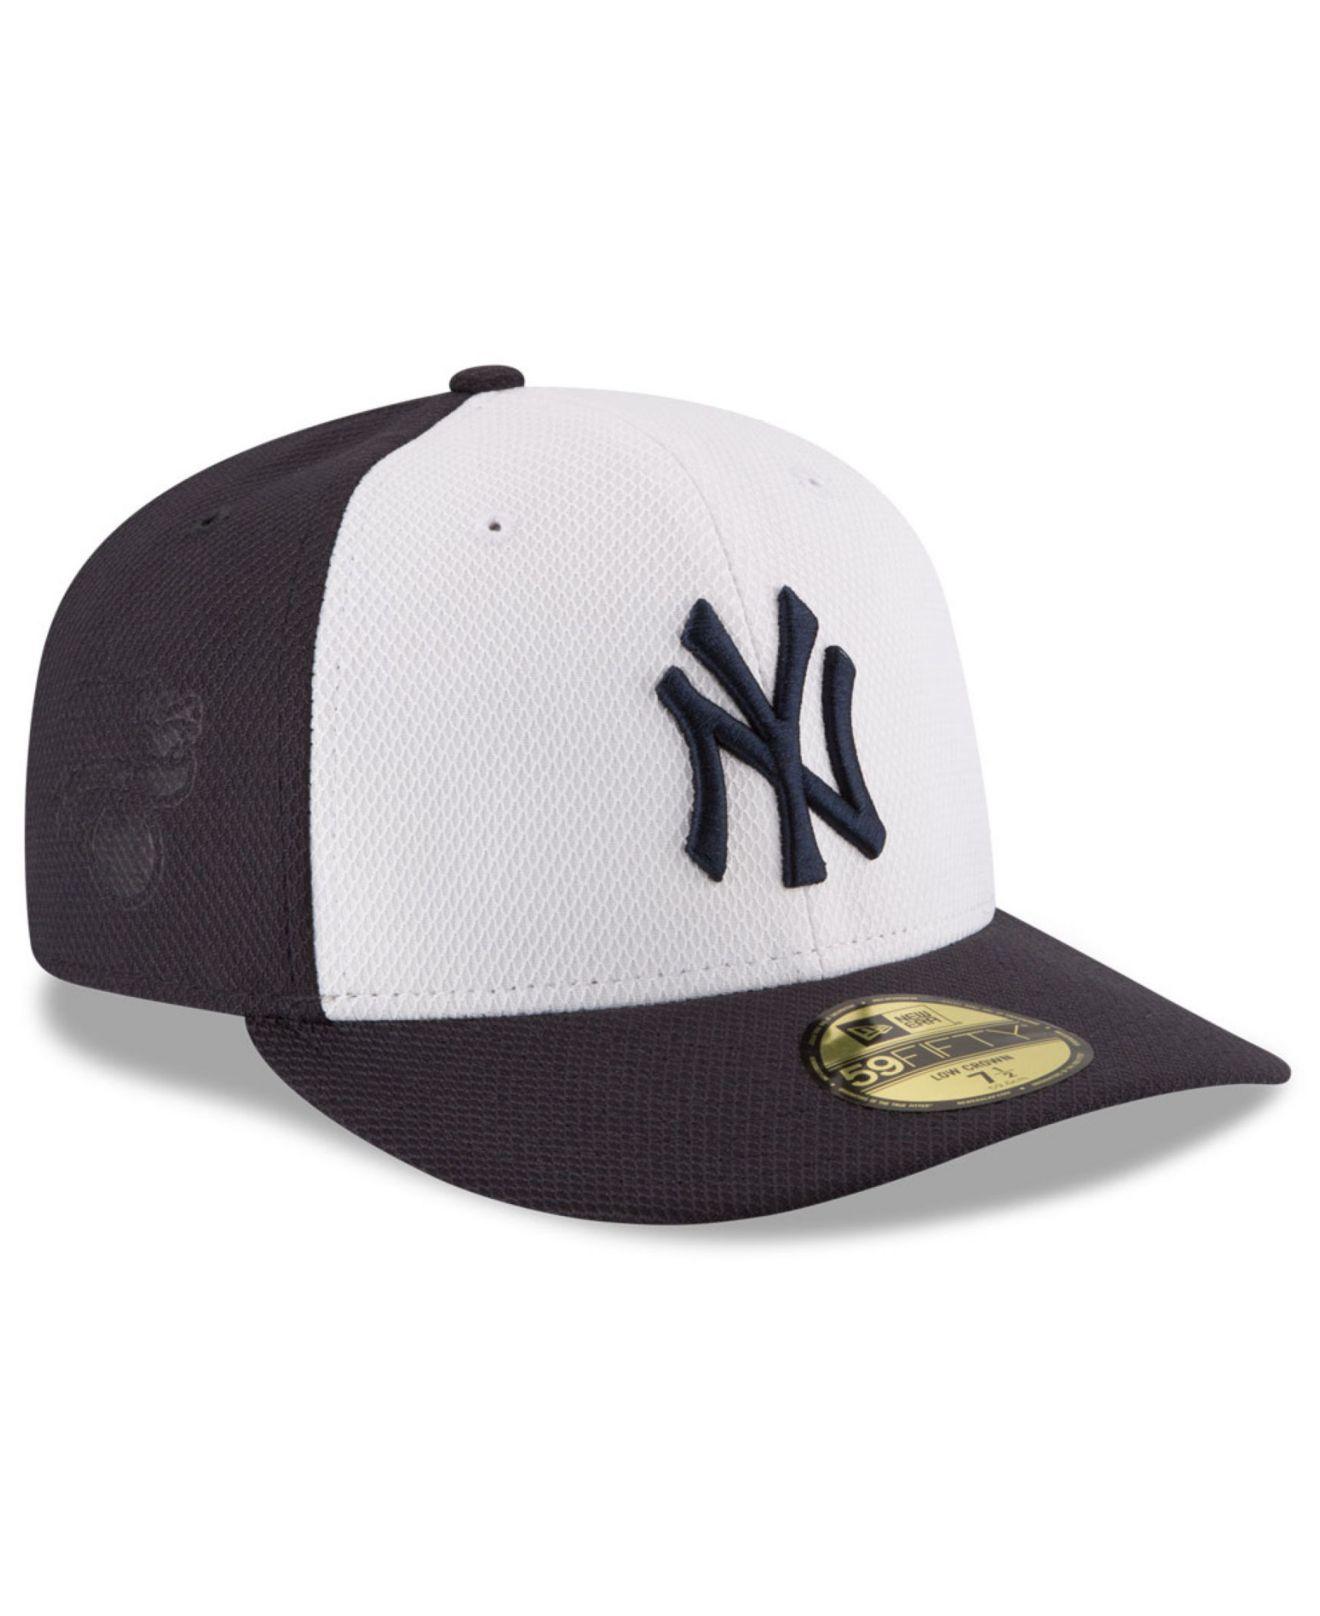 65887cc6cd9f0 Lyst - KTZ New York Yankees Low Profile Diamond Era 59fifty Cap in ...